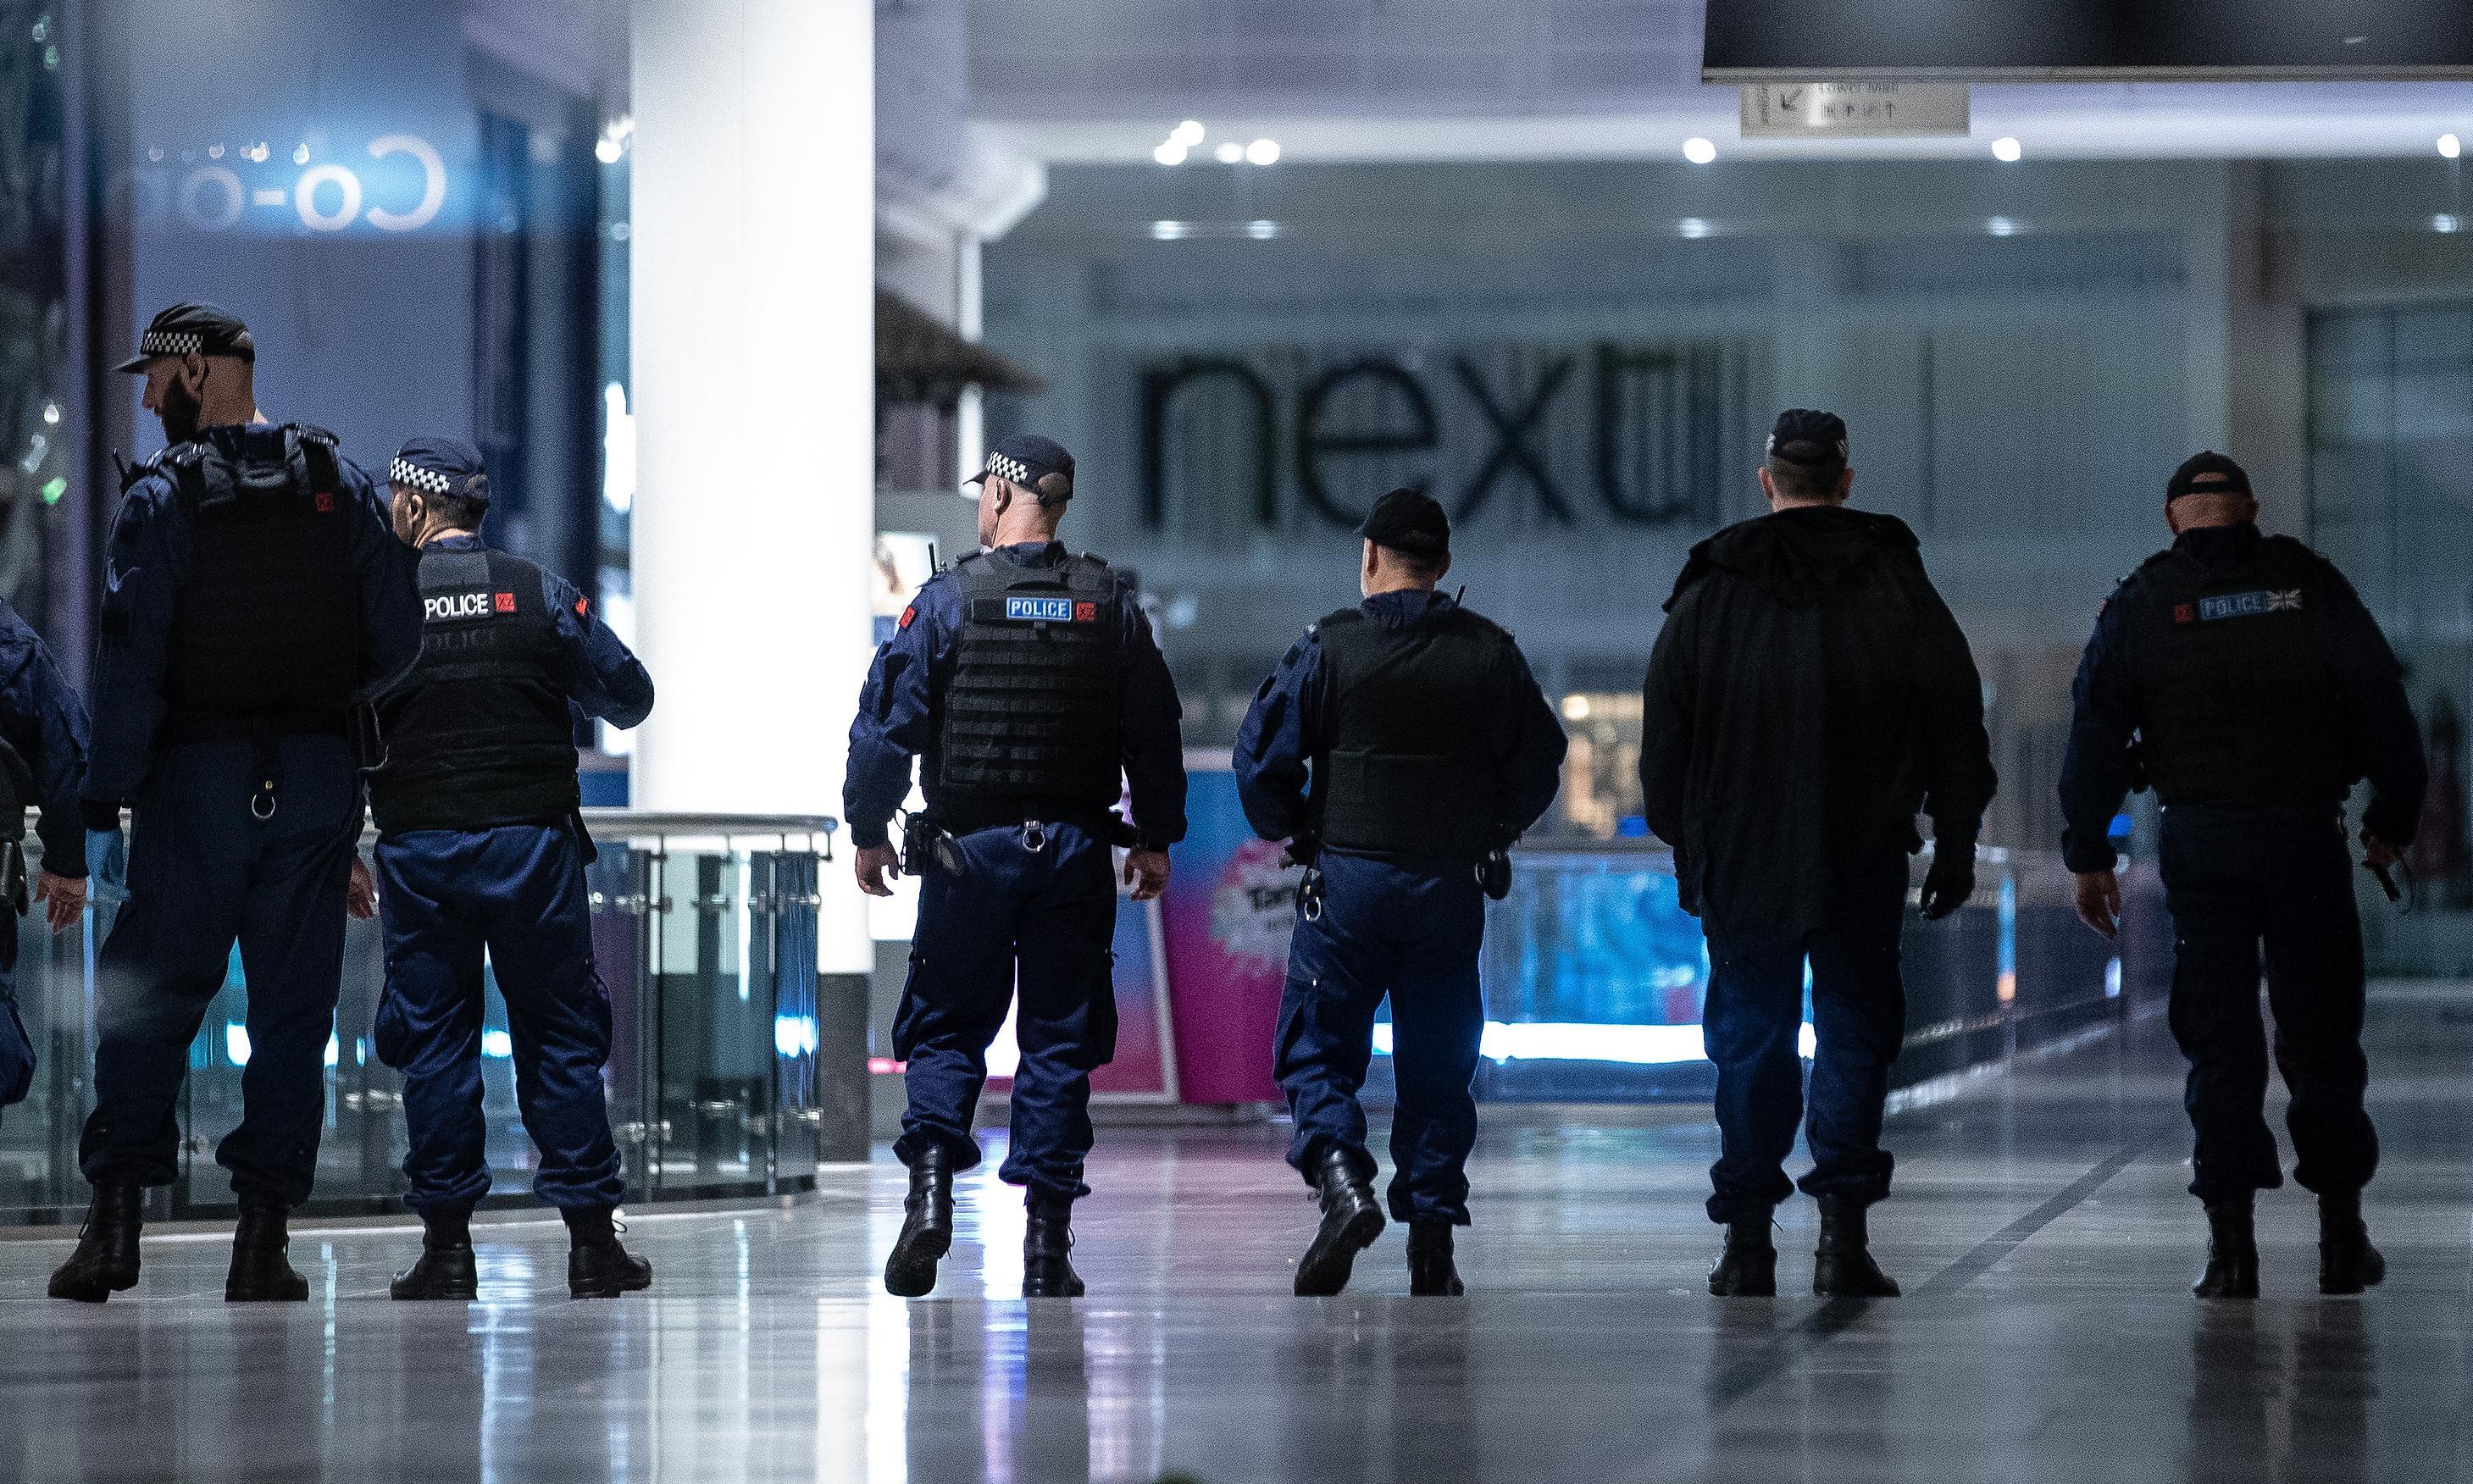 Manchester police arrest man after security incident at Arndale centre